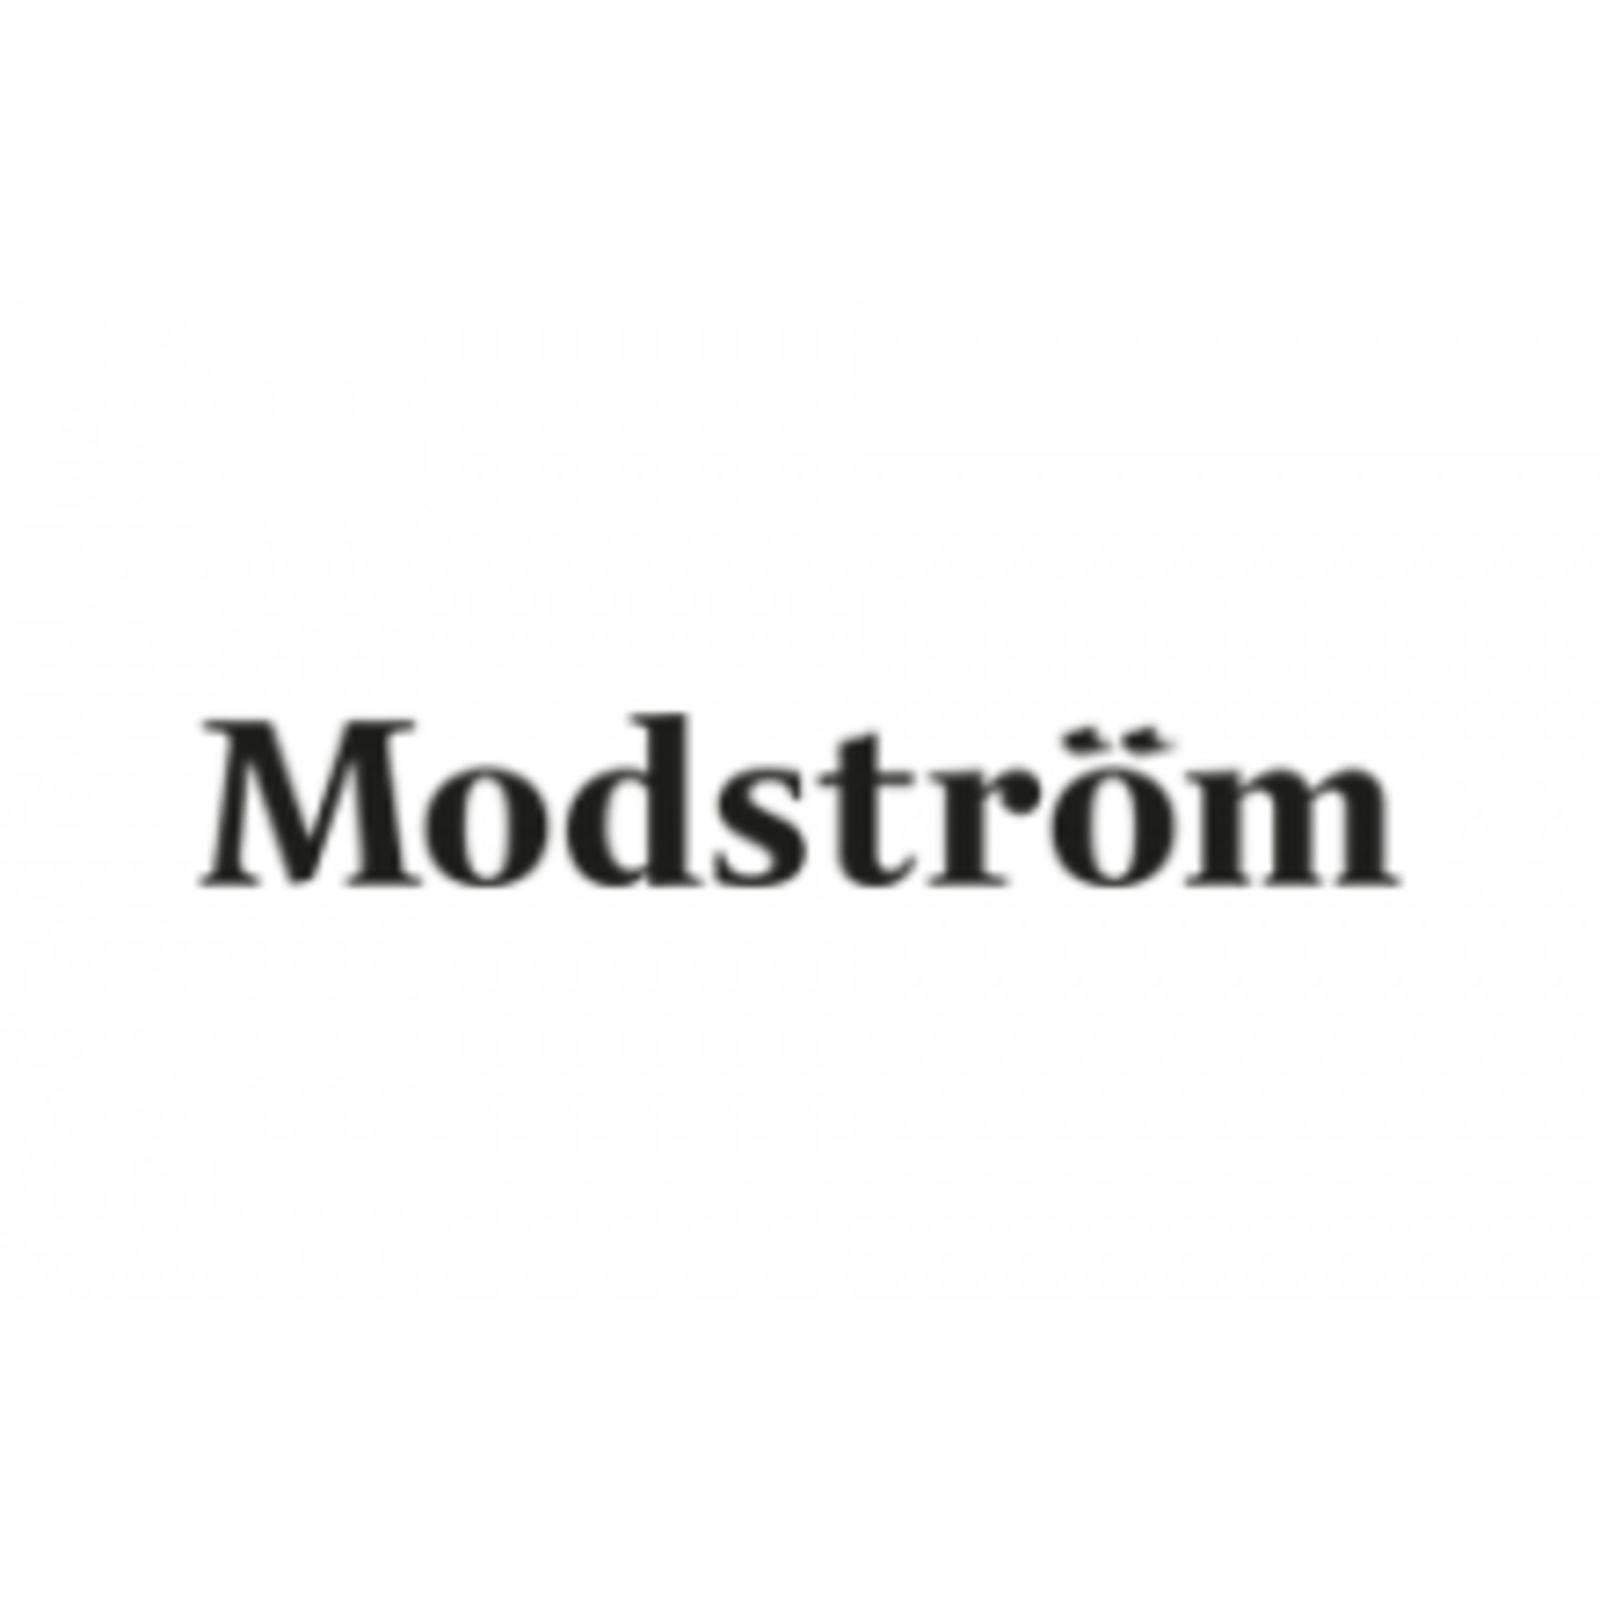 modström (Afbeelding 1)